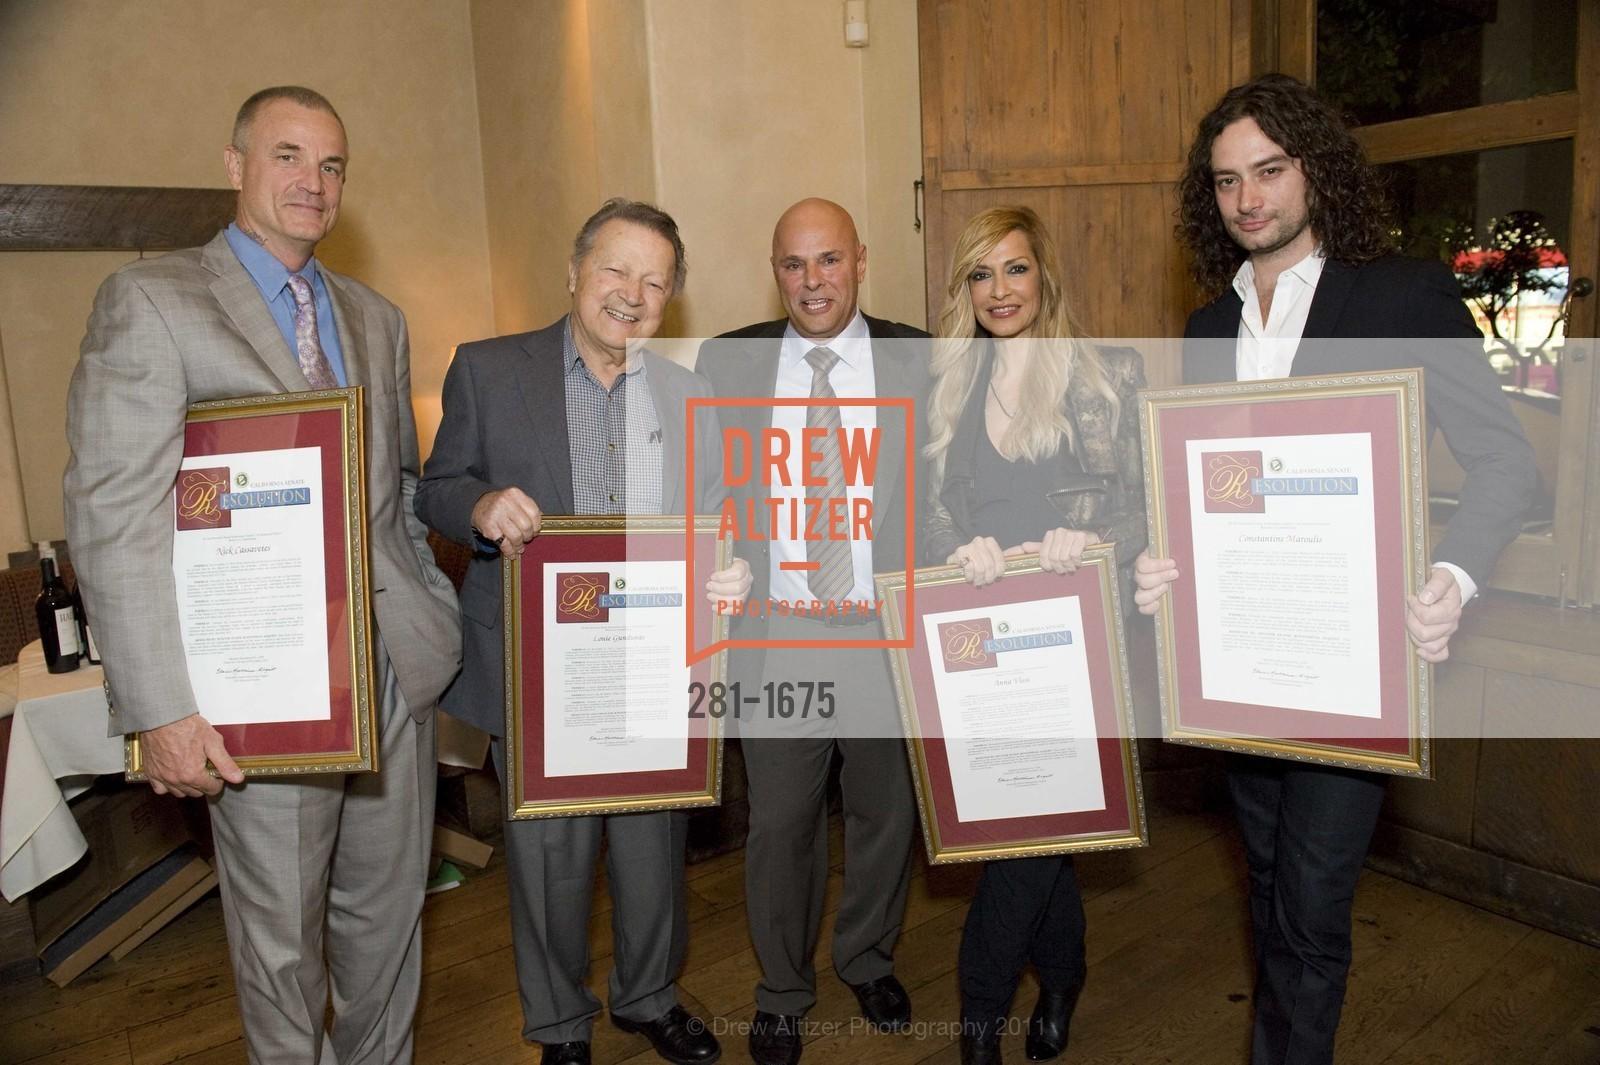 Nick Cassavetes, Louie Gundanas, Tony Saris, Anna Vissi, Constantine Maroulis, Photo #281-1675